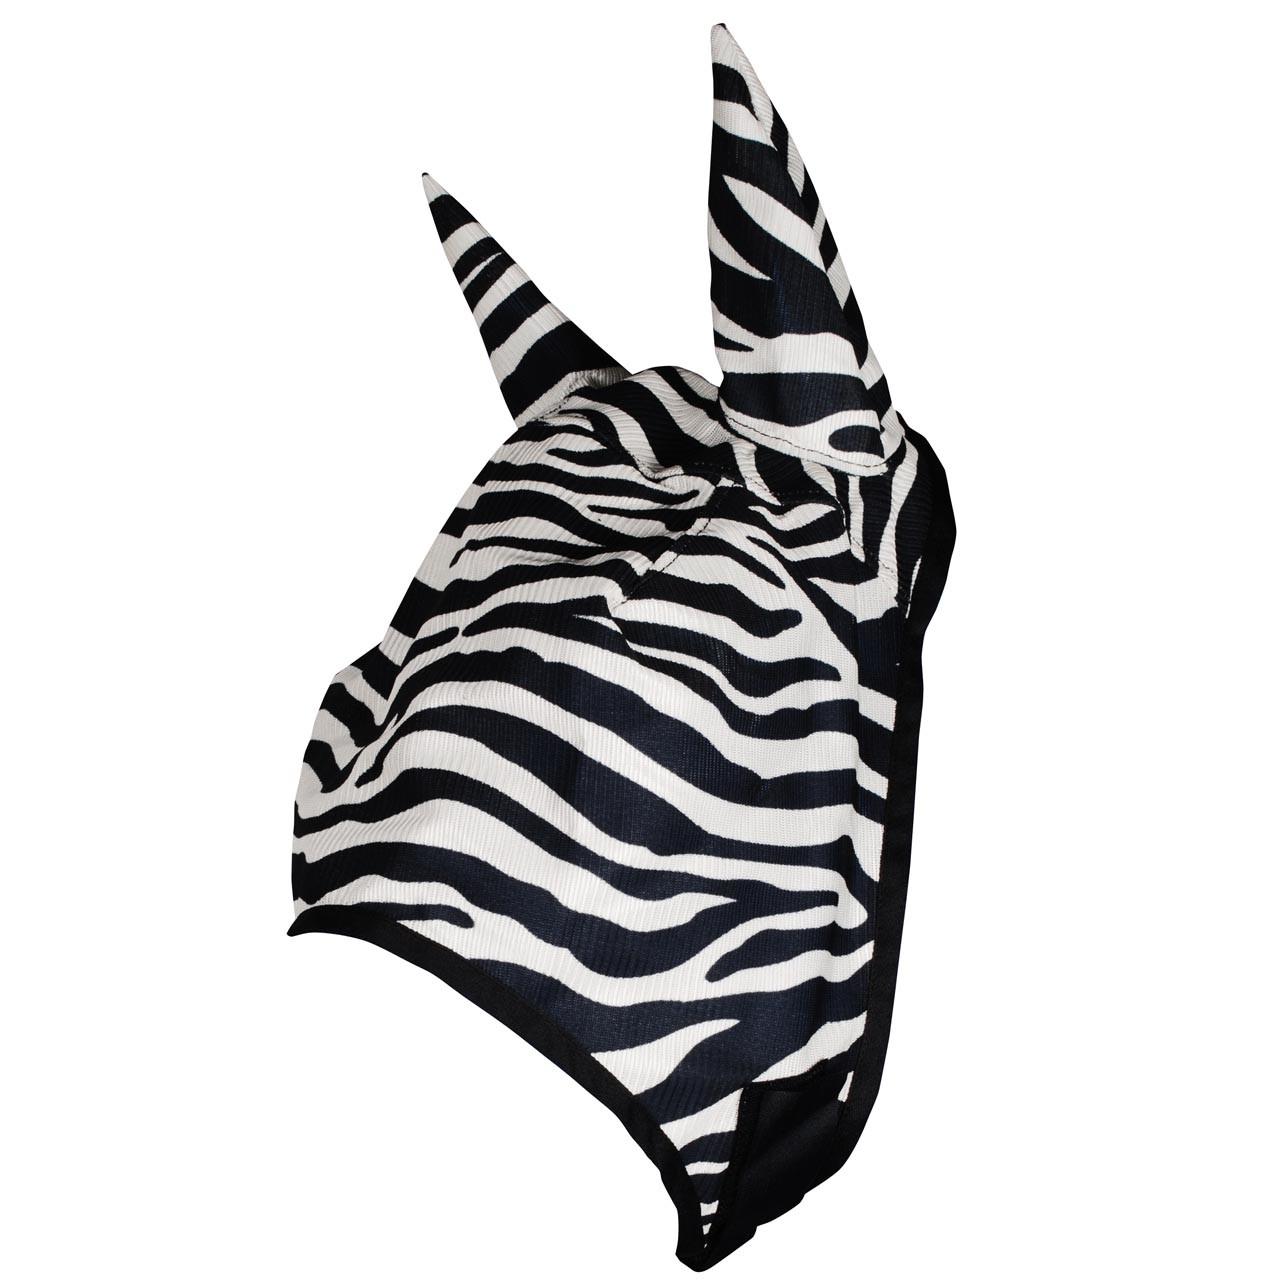 Pagony Zebra vliegenmasker zwart/wit maat:full